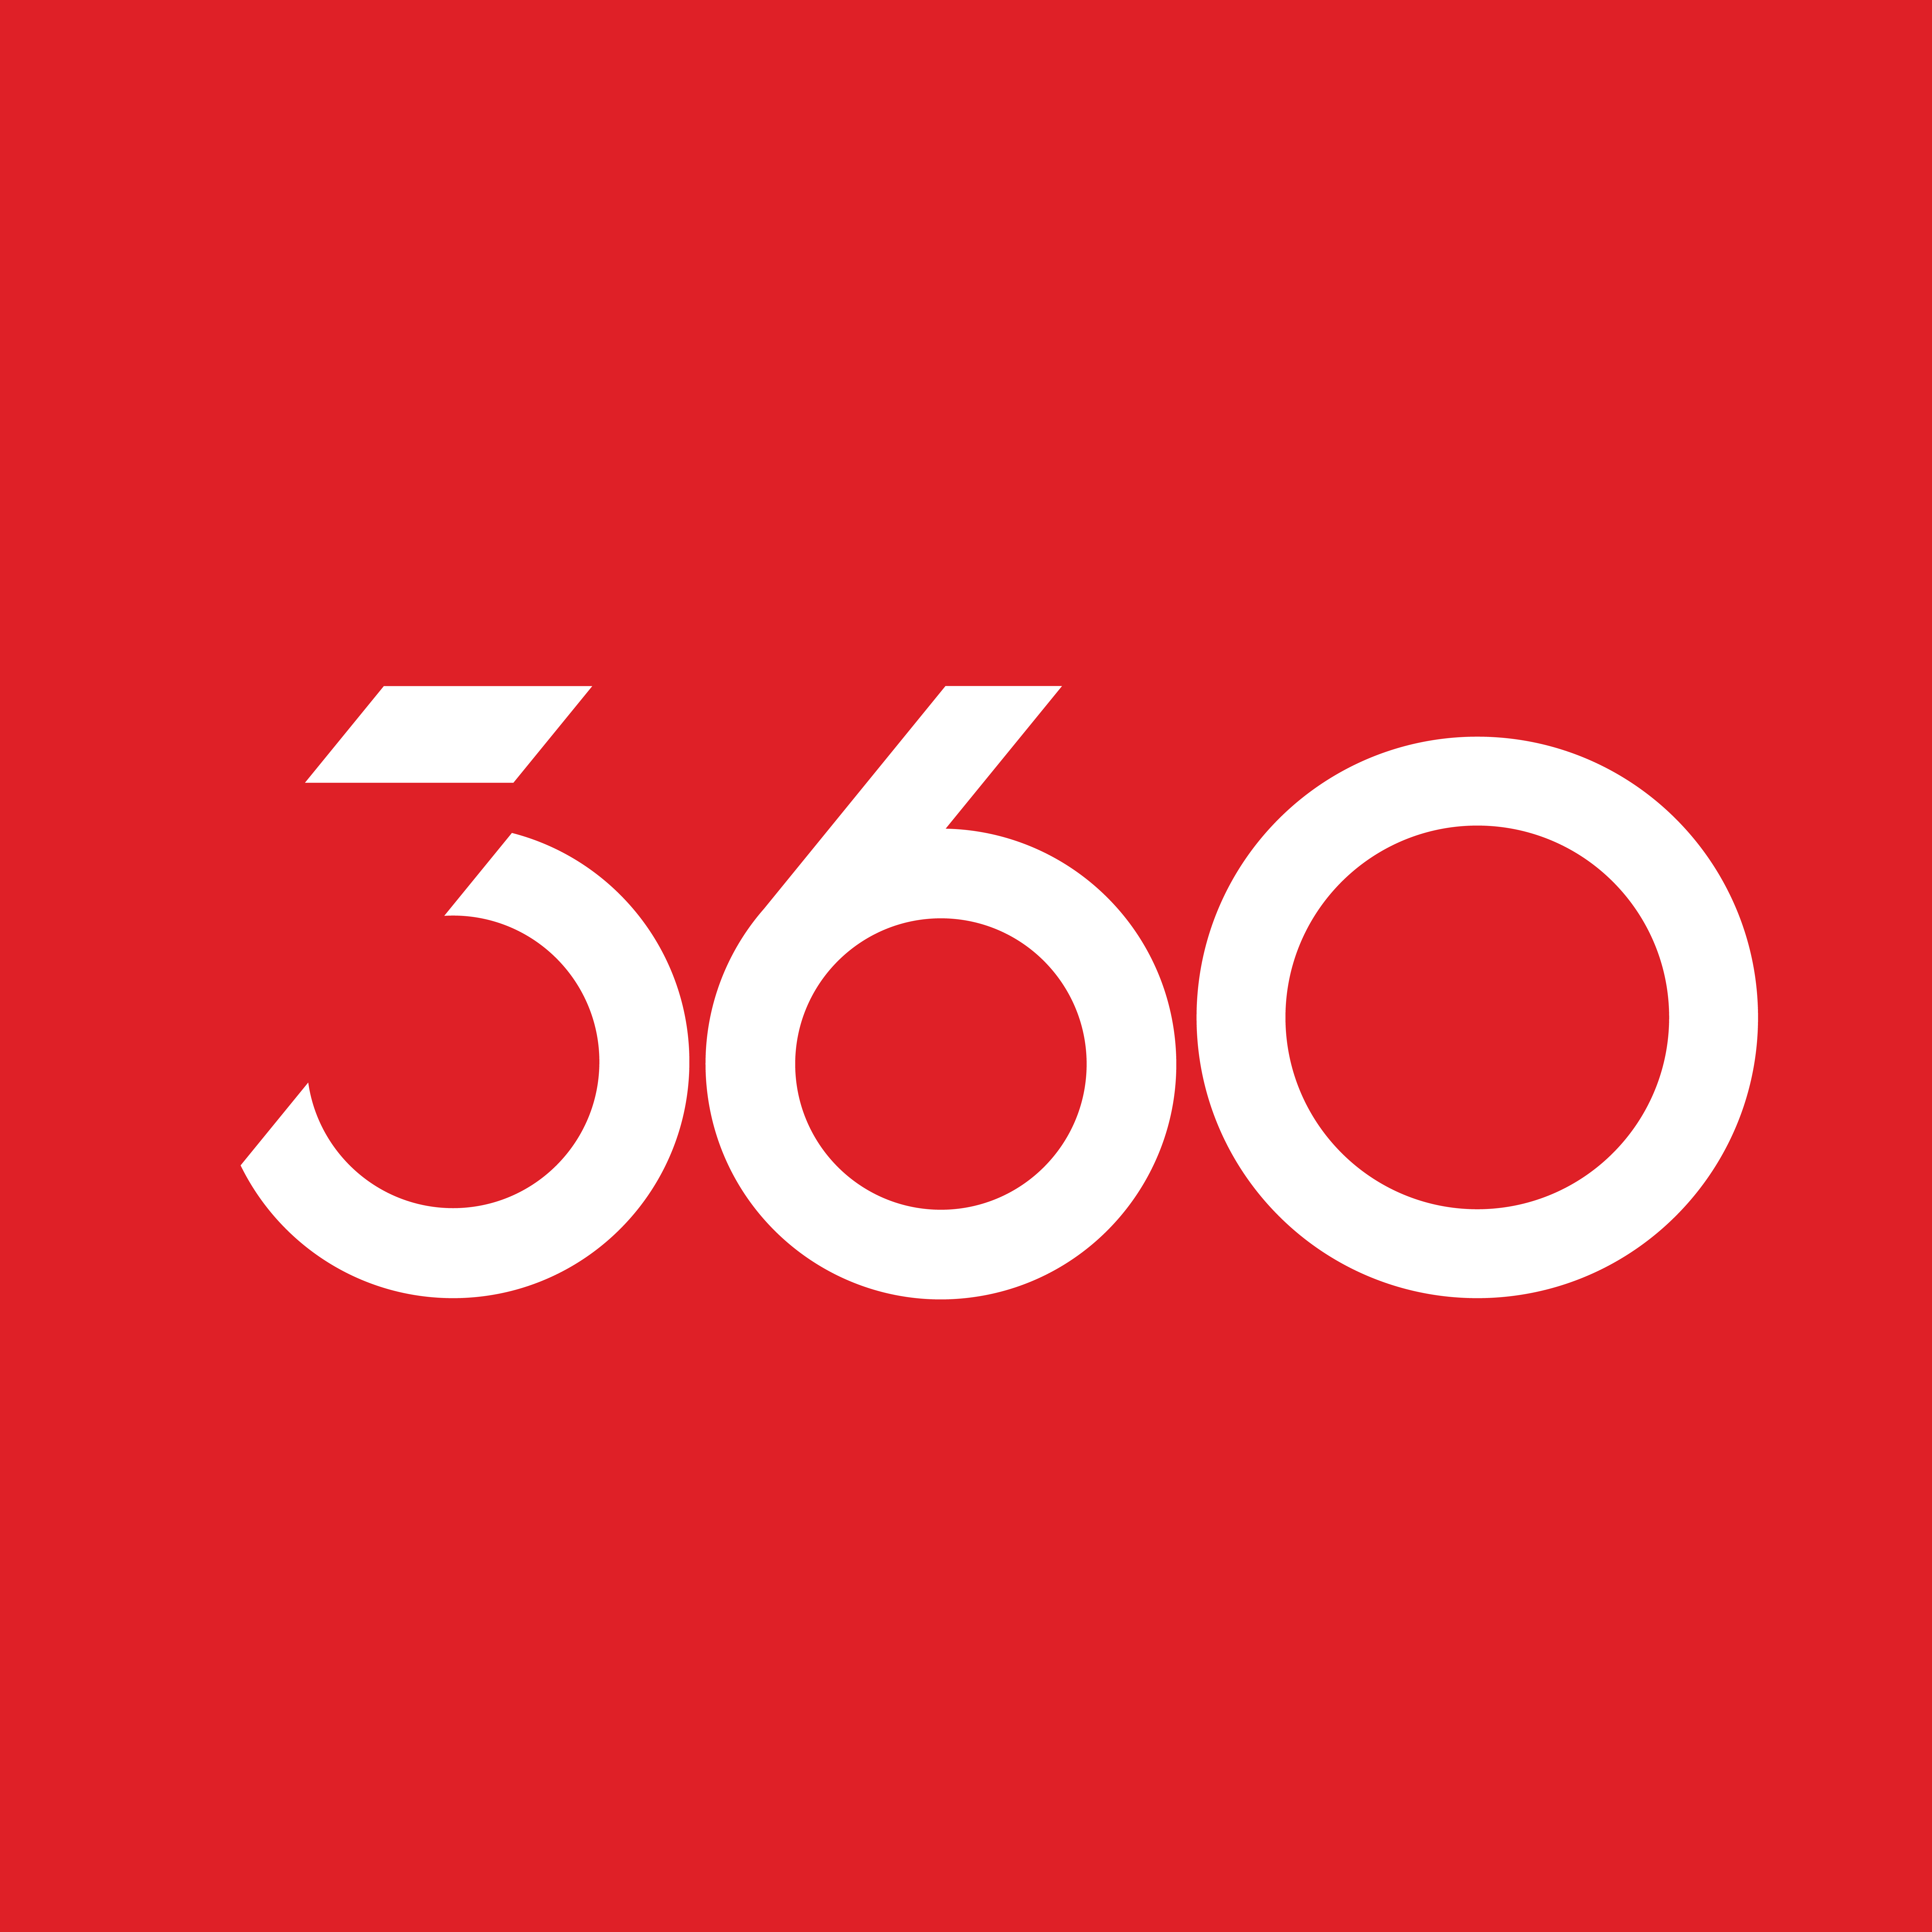 Avatar - ENGENHARIA 360